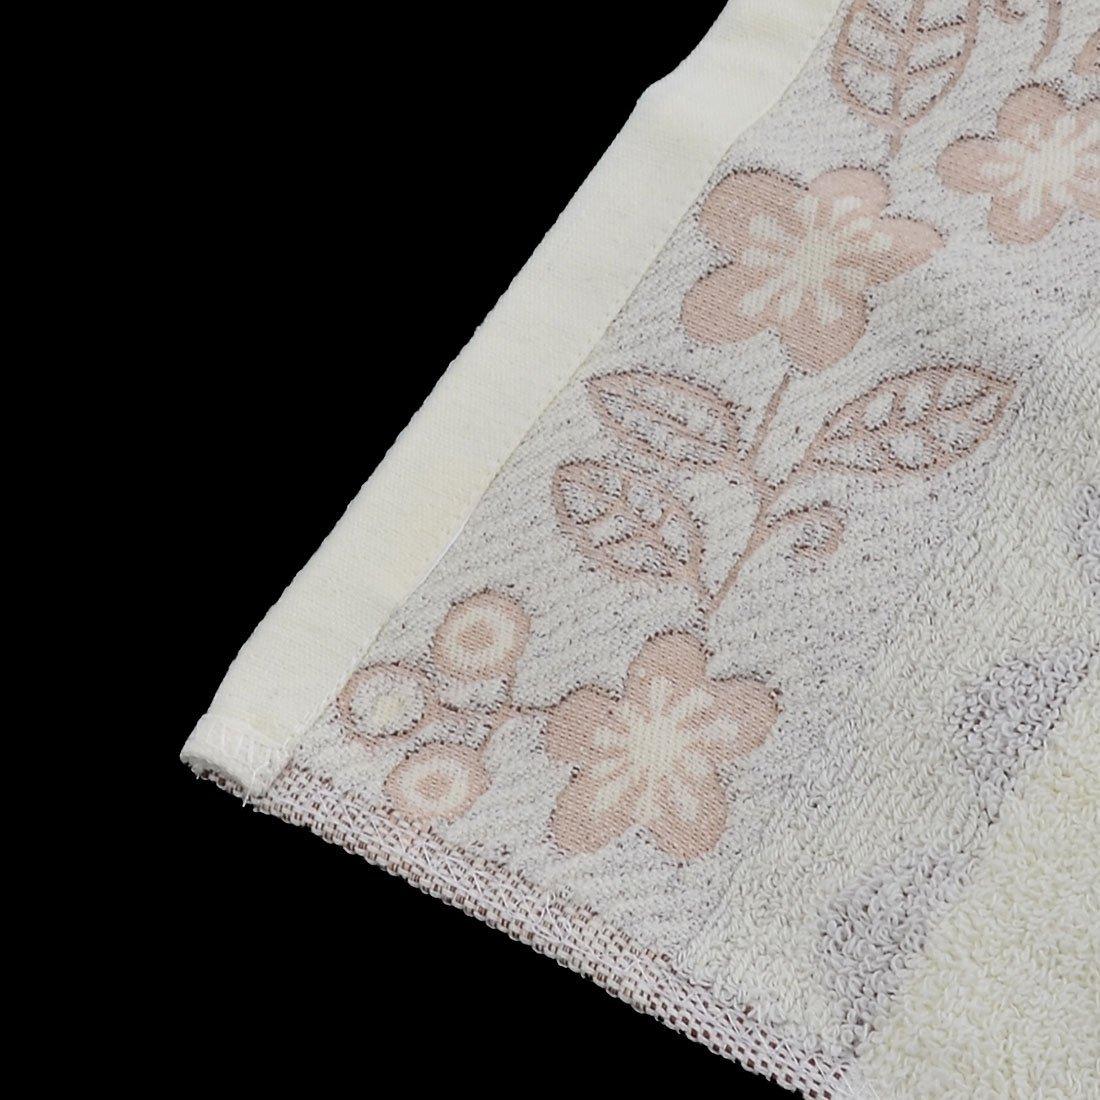 Amazon.com: eDealMax Mezclas de algodón Flor Toalla del inmueble Apartamento Baño Bañera paño de 140 x 70 cm Beige: Home & Kitchen